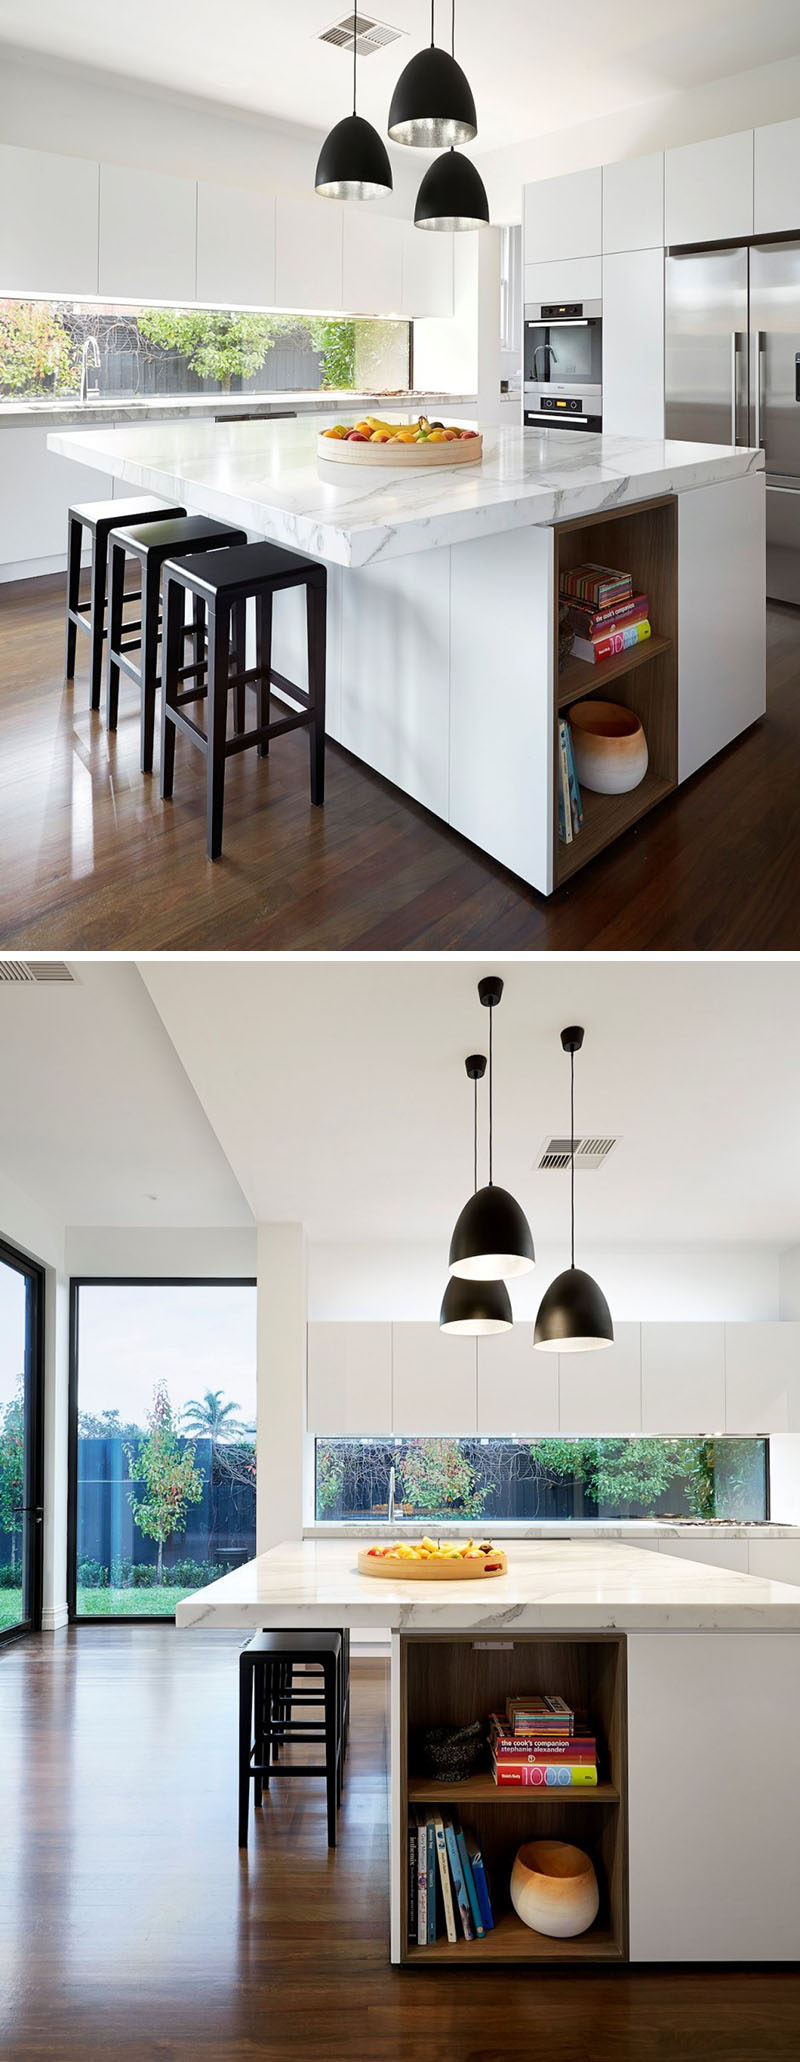 This white kitchen has wood built-in shelving in the kitchen island that's ideal for storing cookbooks. #WhiteKitchen #BuiltInShelves #WoodLinedShelves #KitchenIsland